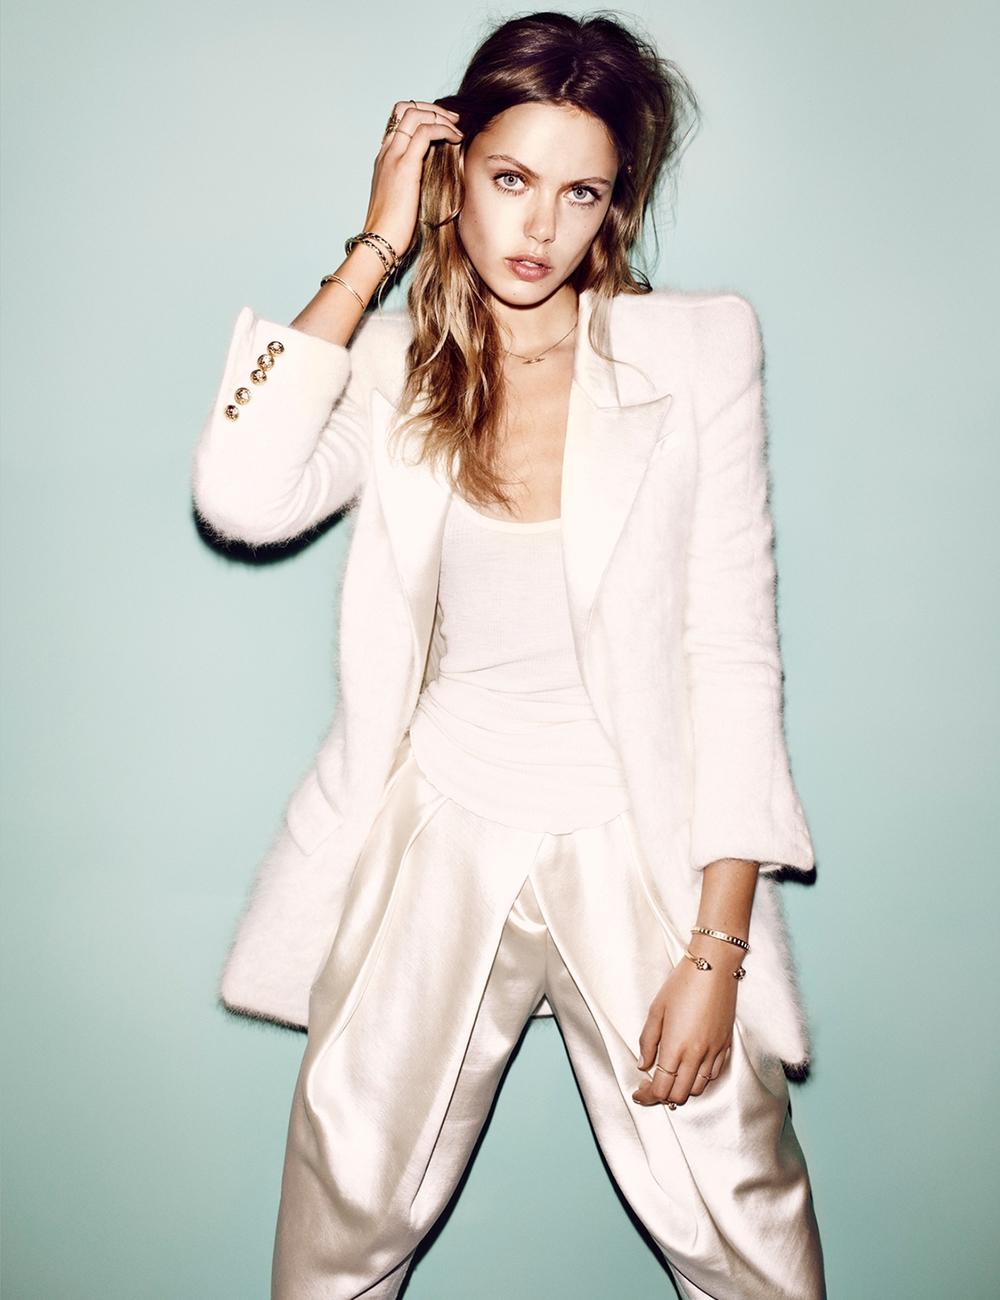 Frida-Gustavsson-by-Hasse-Nielsen-Carte-Blanche-Vogue-Germany-December-2013-3.jpg